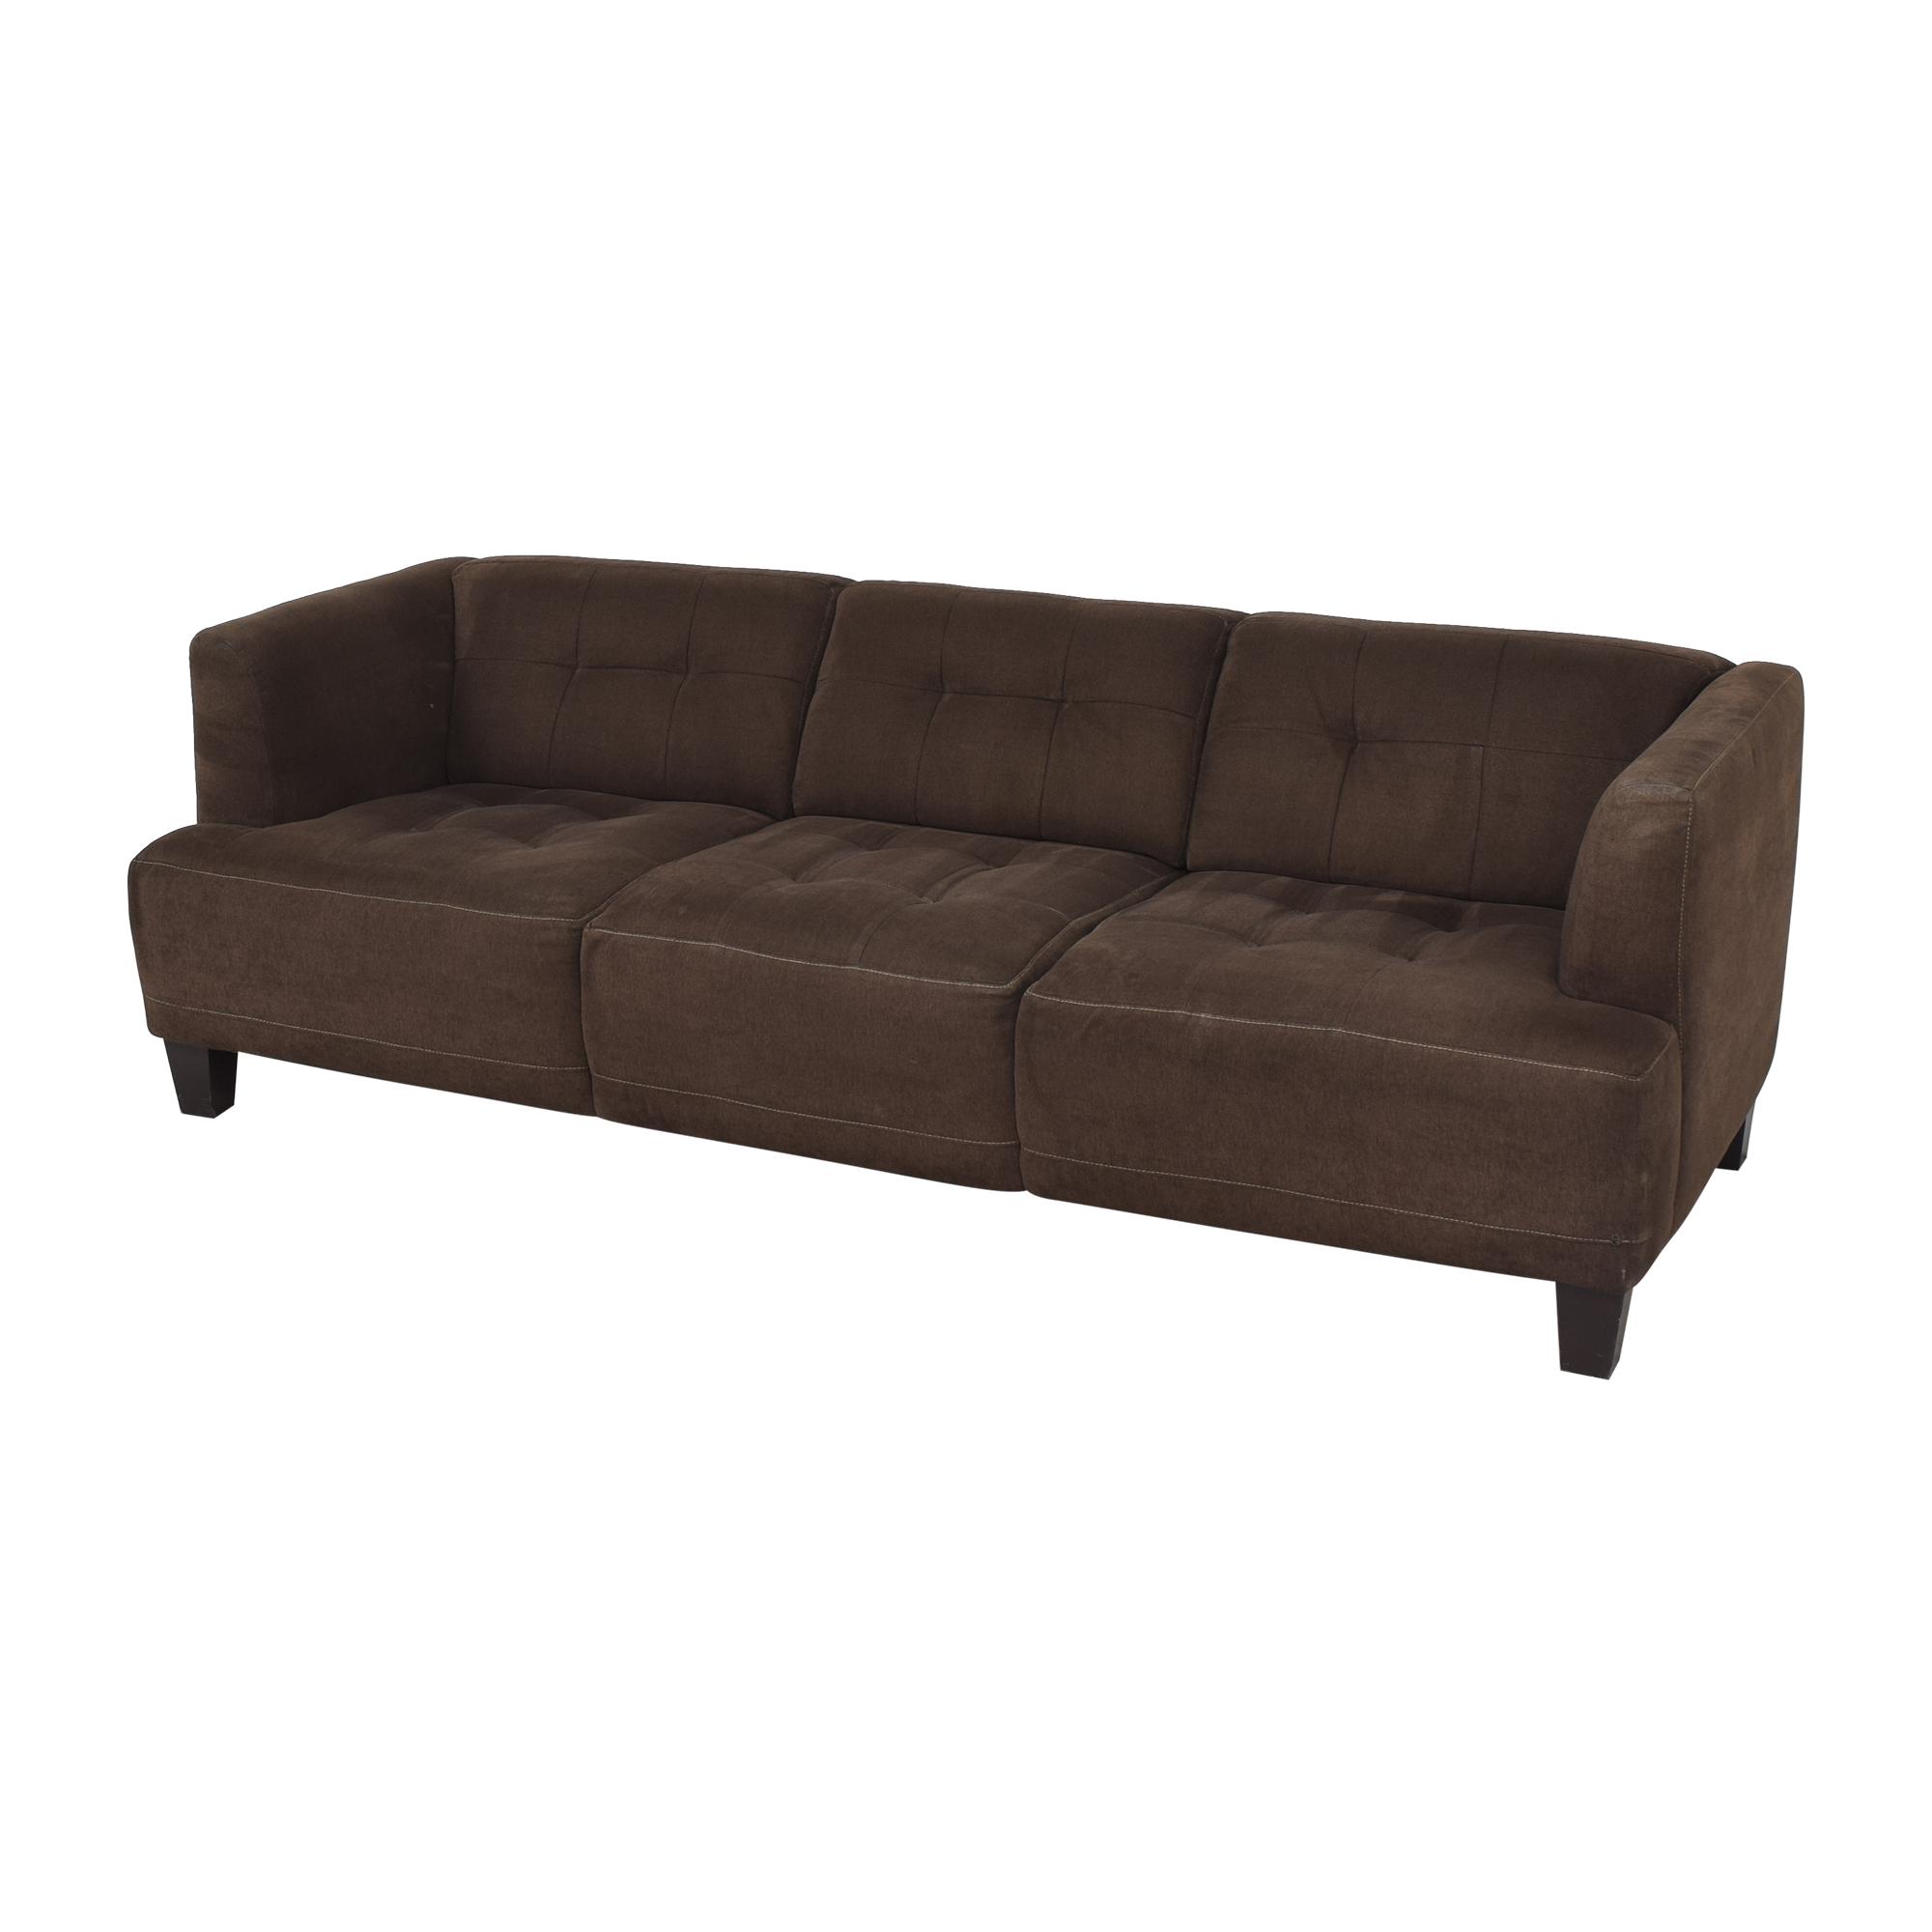 shop Macy's Jonathan Louis Three Cushion Sofa Macy's